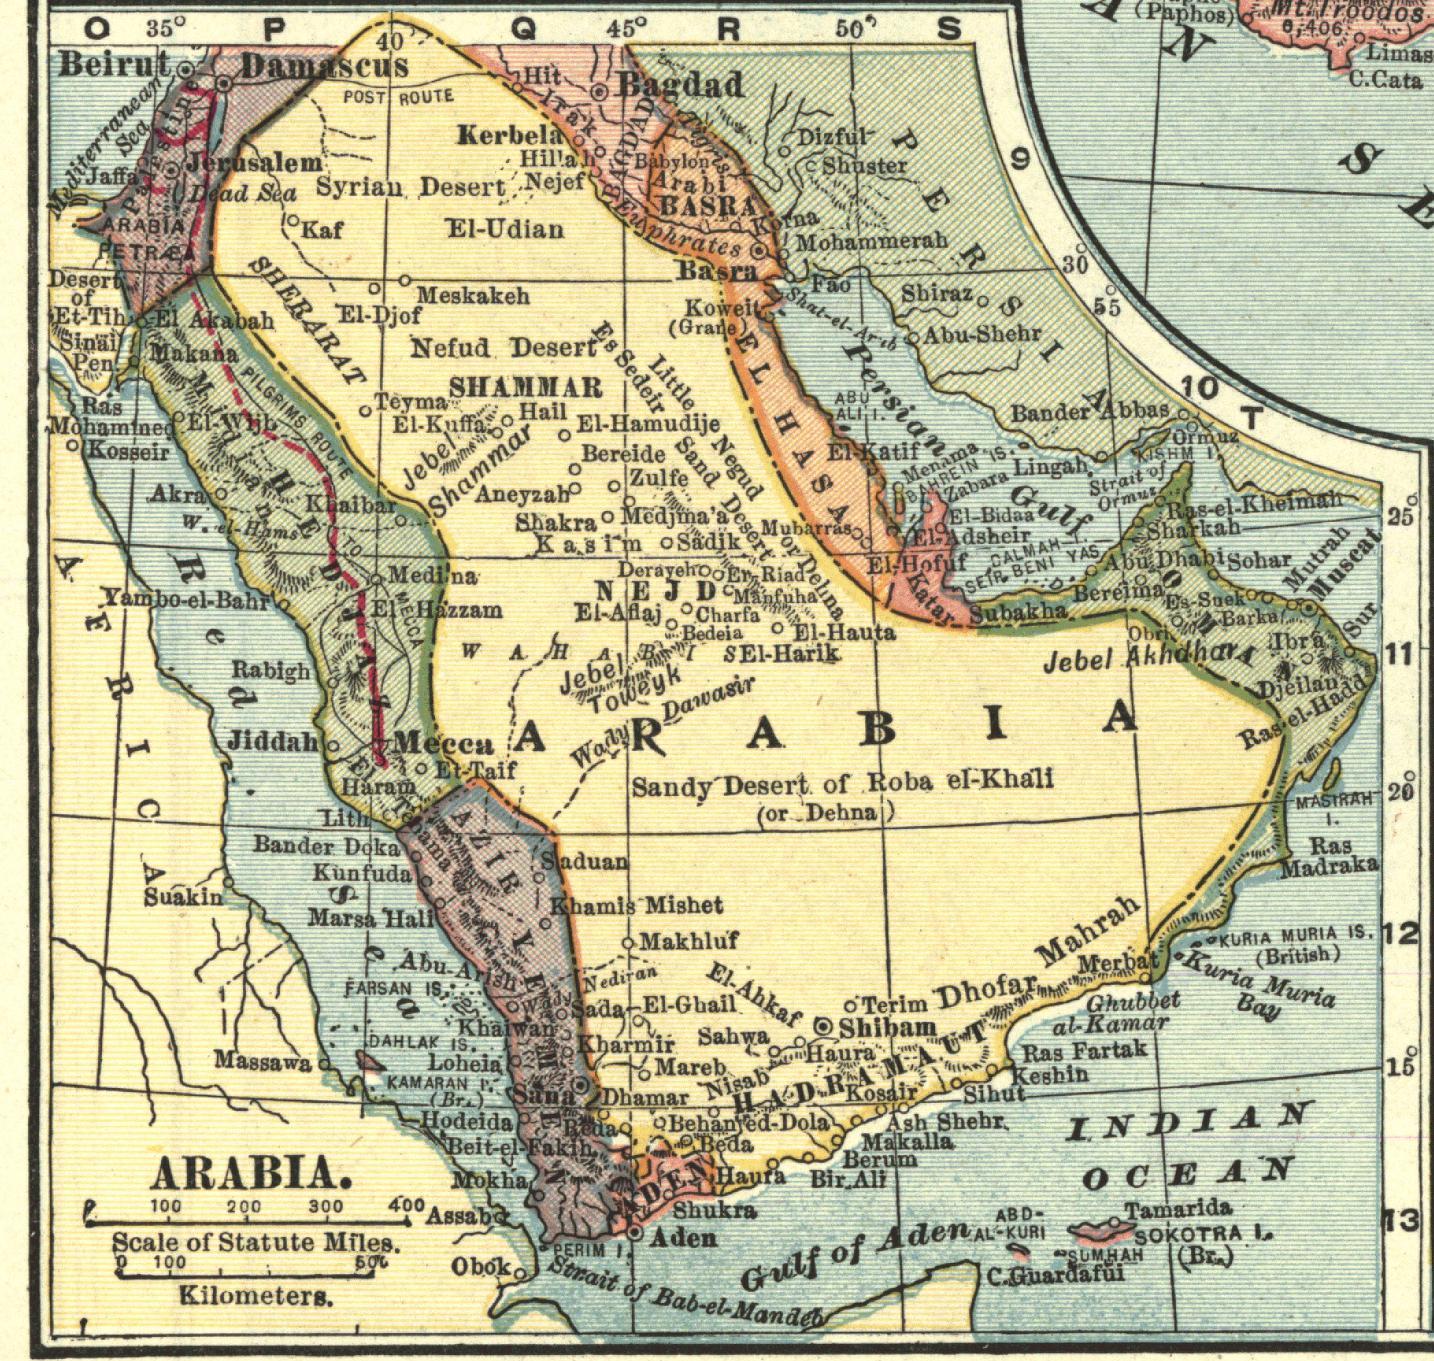 File:Arabian peninsula, 1909 (cropped).jpg - Wikimedia Commons